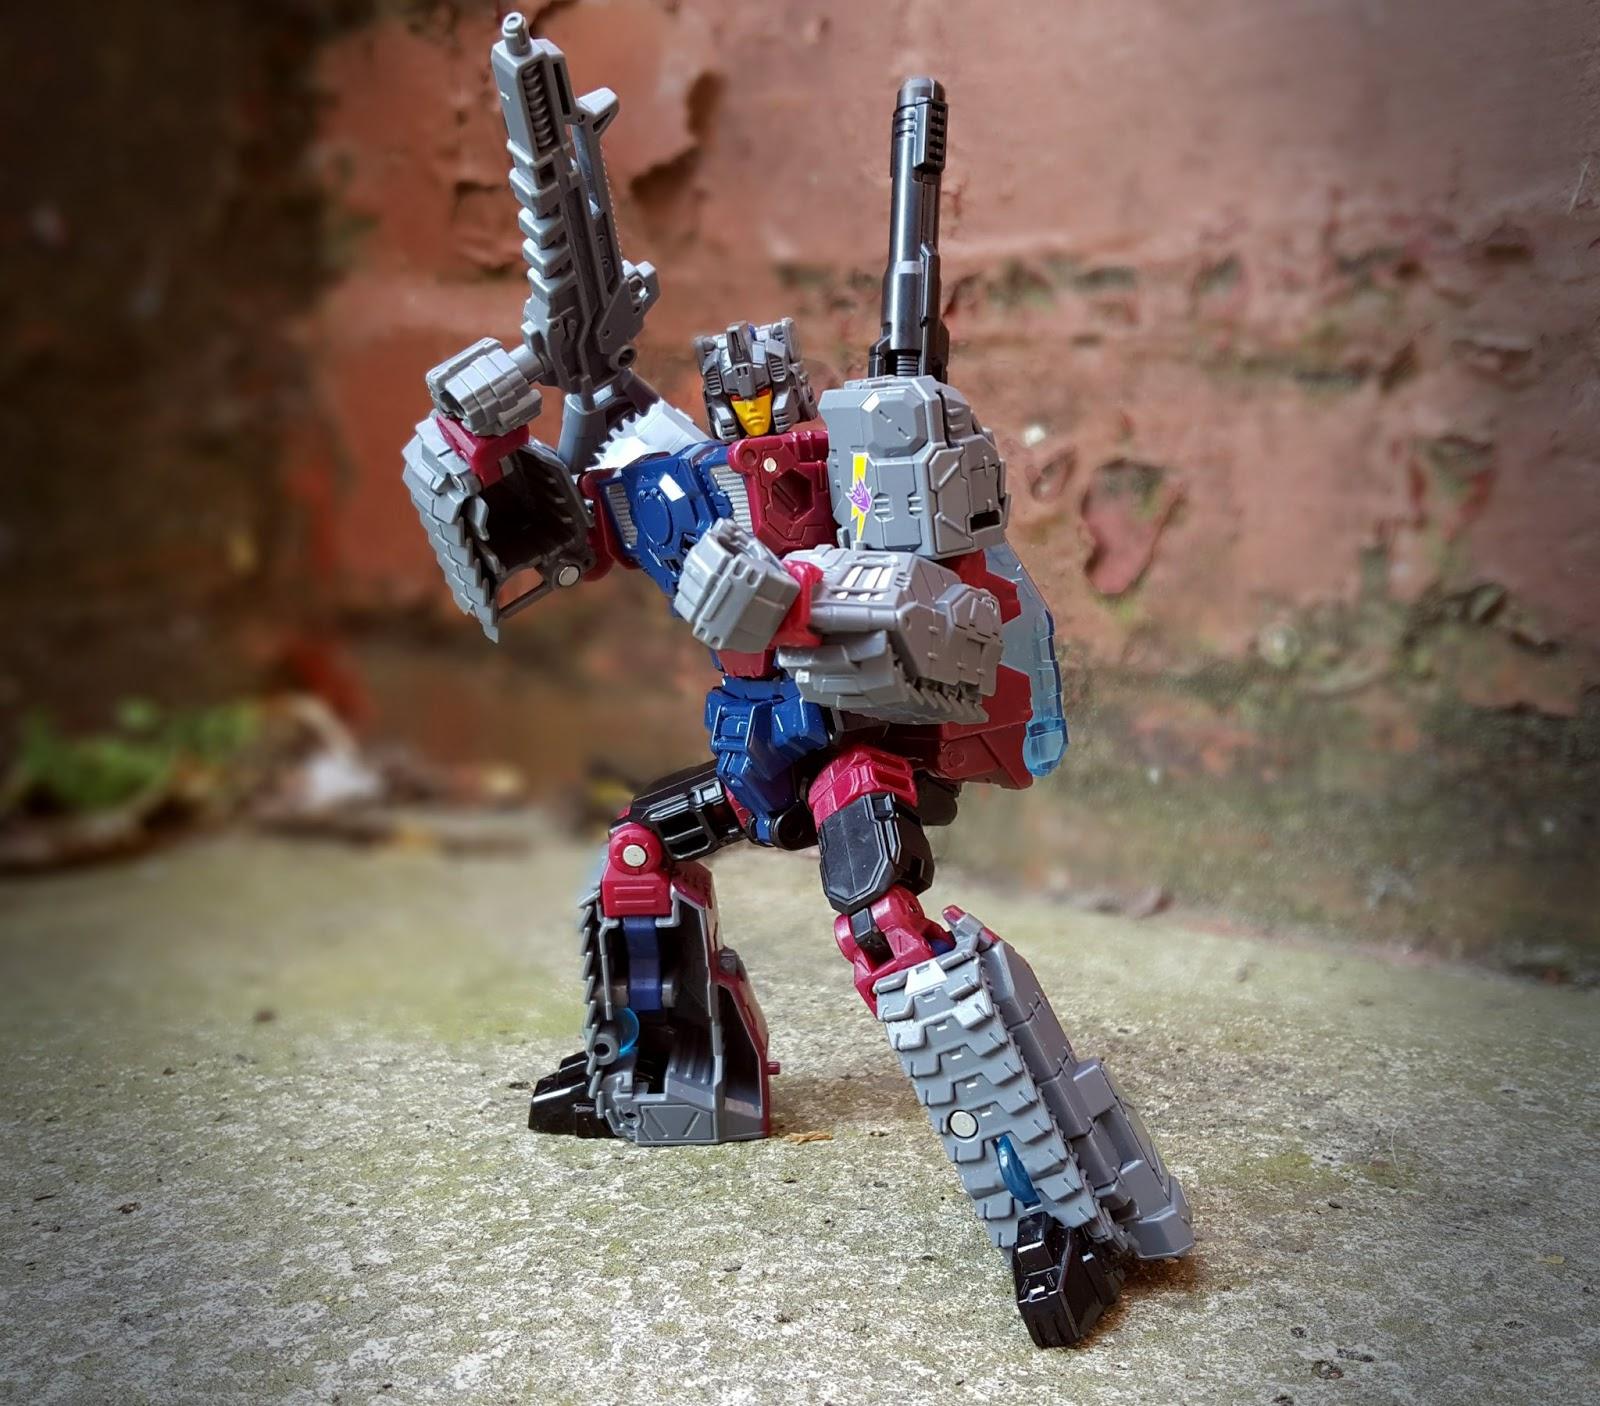 TRANSFORMERS HASBRO Quake no box TITANS RETURN rare